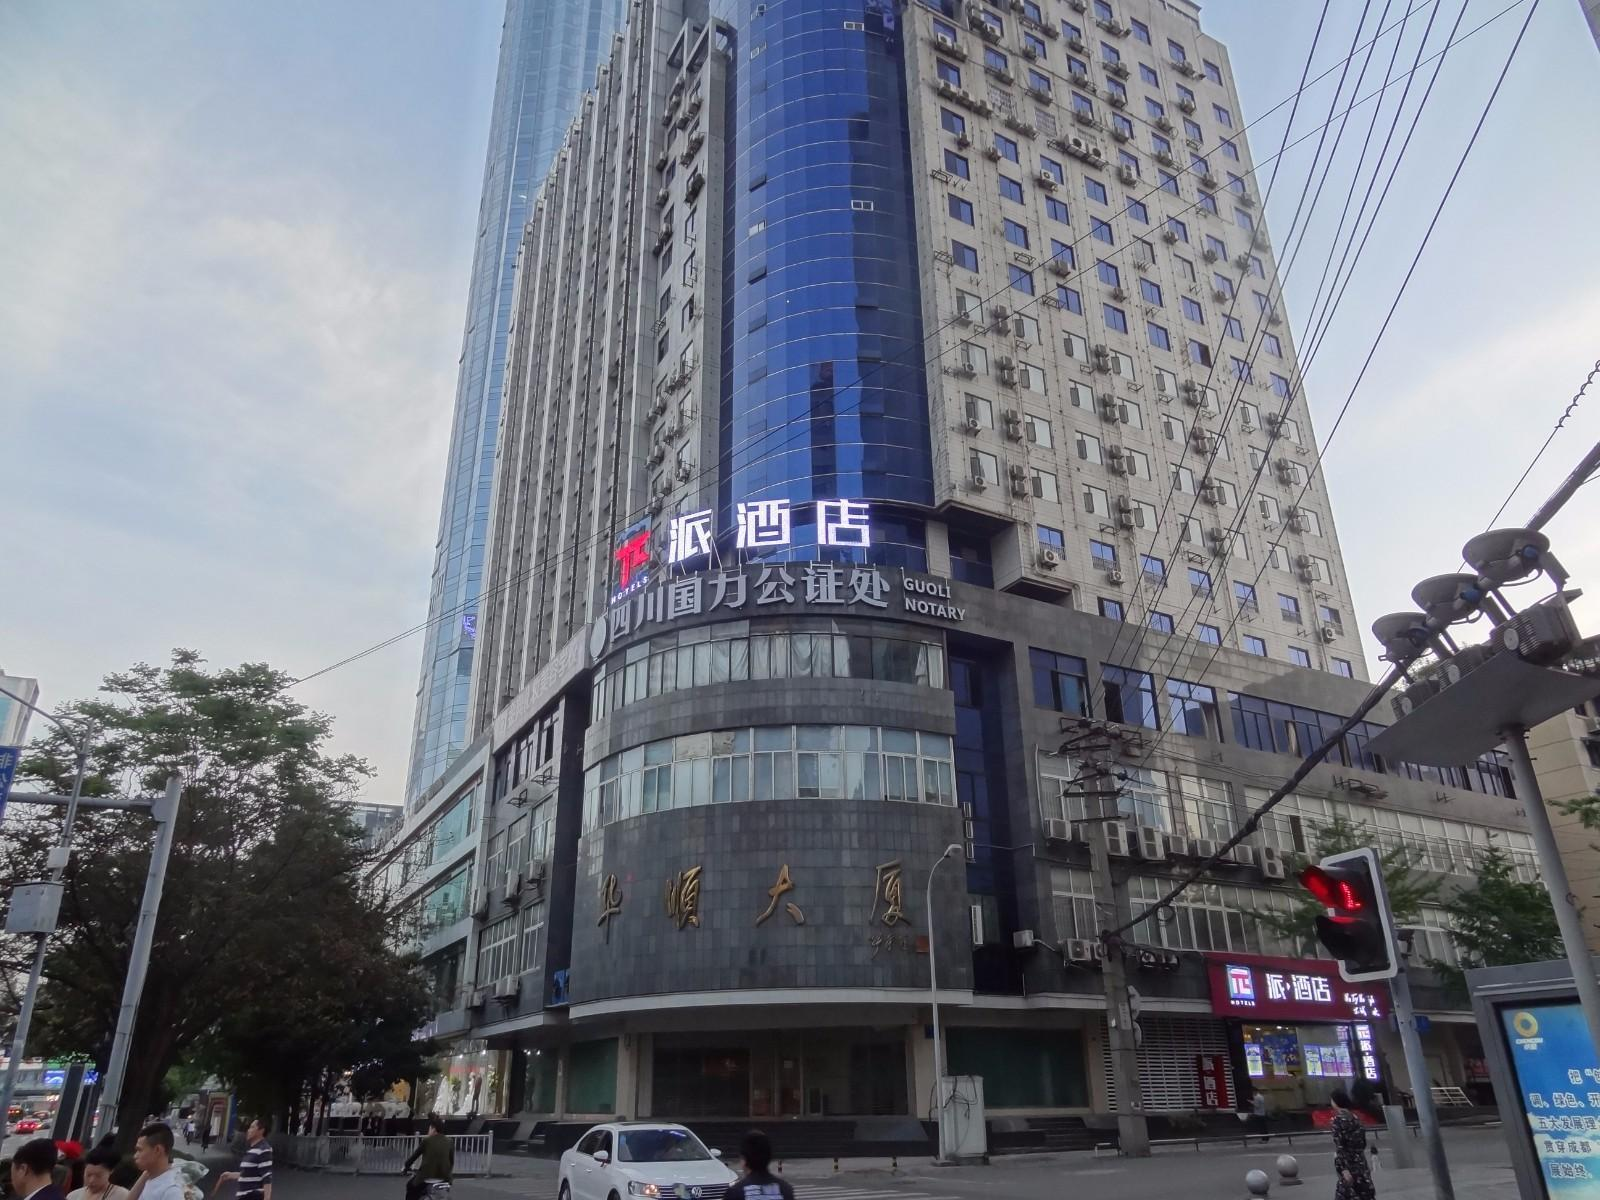 Pai Hotel Chengdu Tianfu Square Subway Station